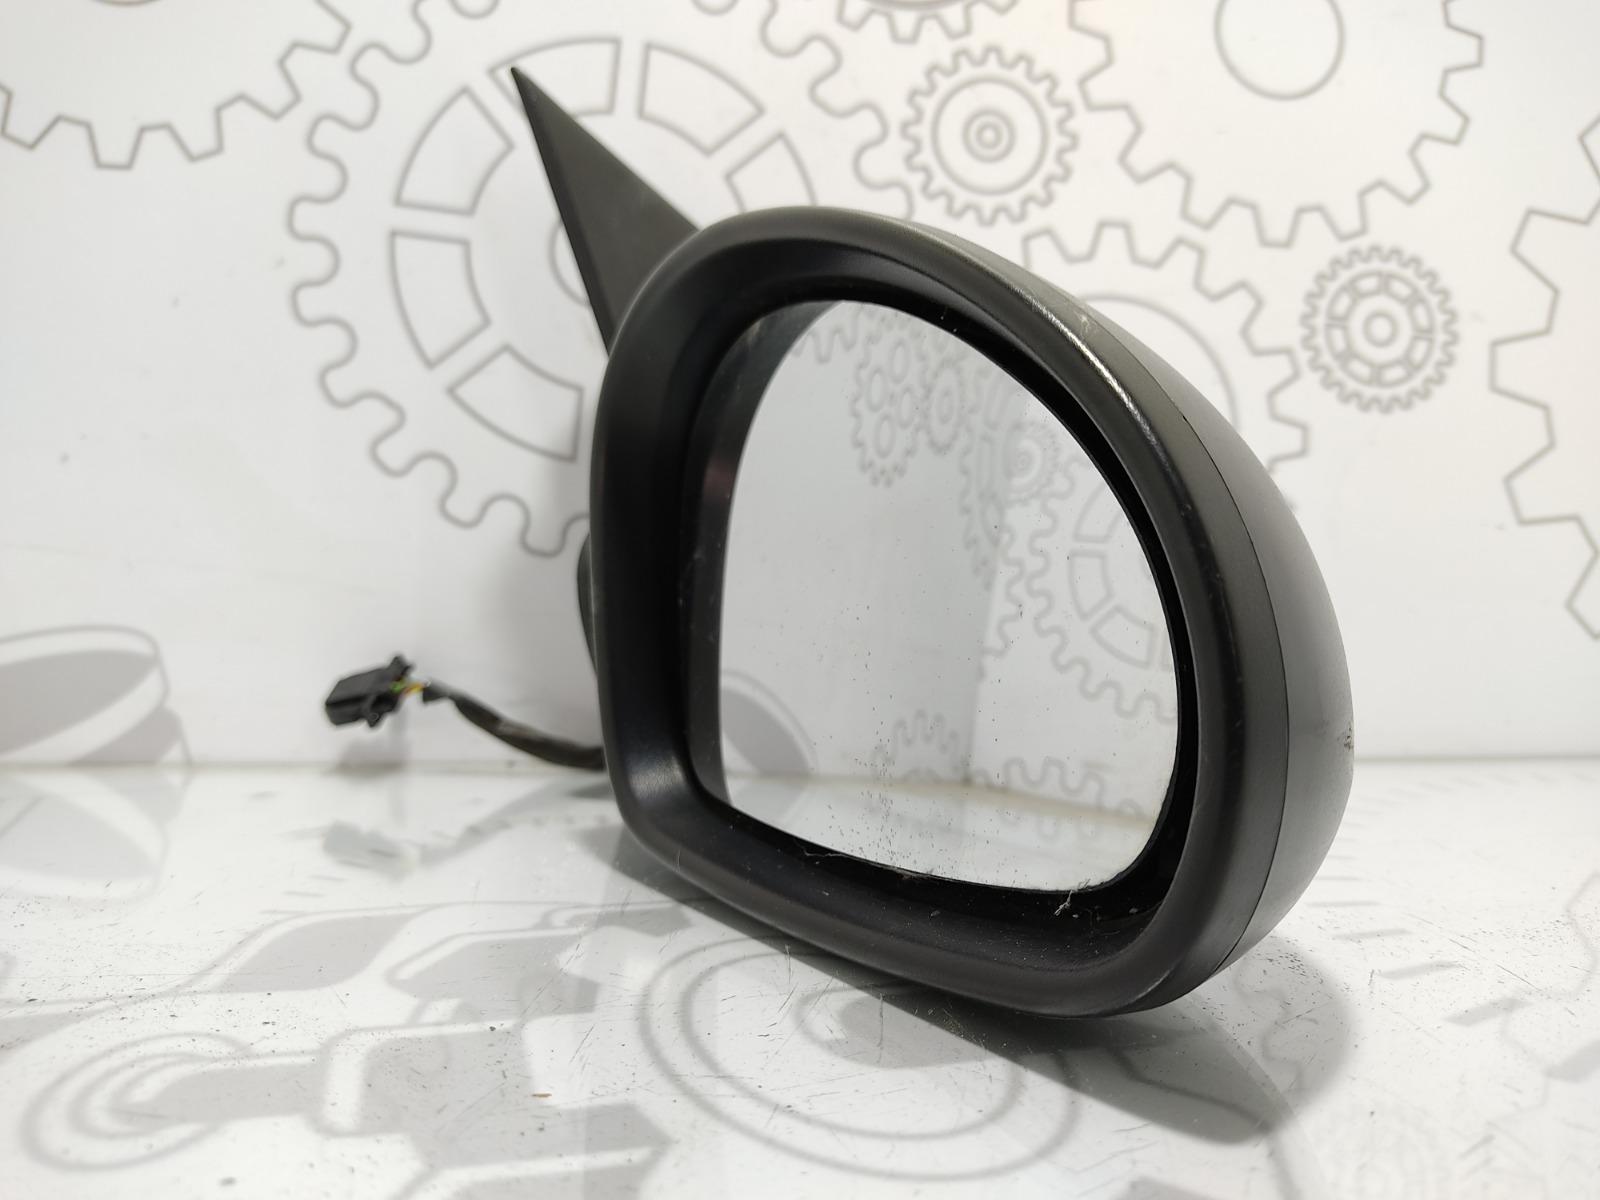 Зеркало наружное правое Seat Altea 1.9 TDI 2008 (б/у)